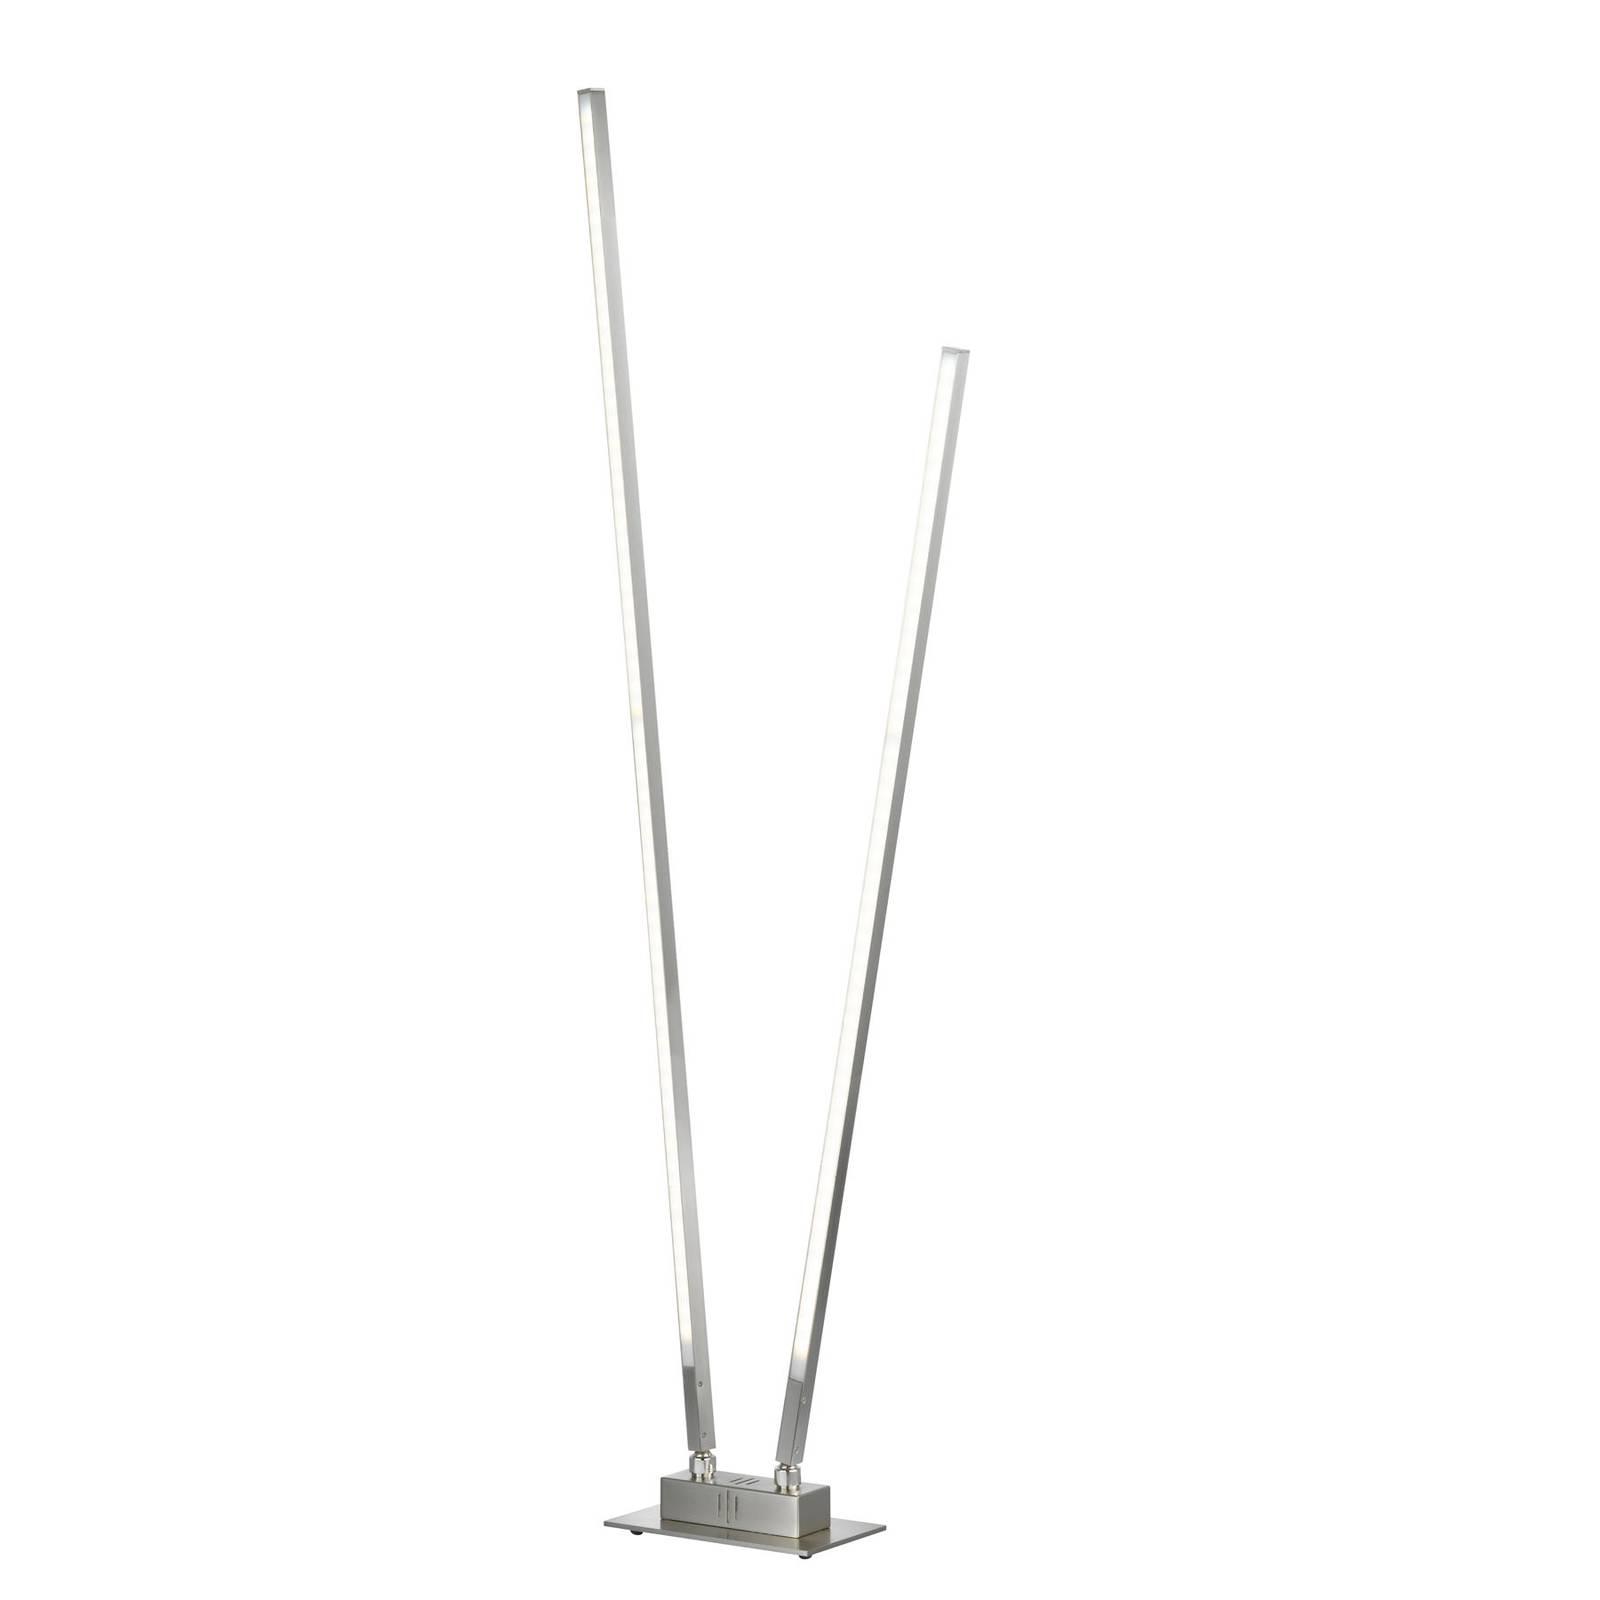 LED-Stehleuchte Z-Carla, zweiflammig, Höhe 144 cm